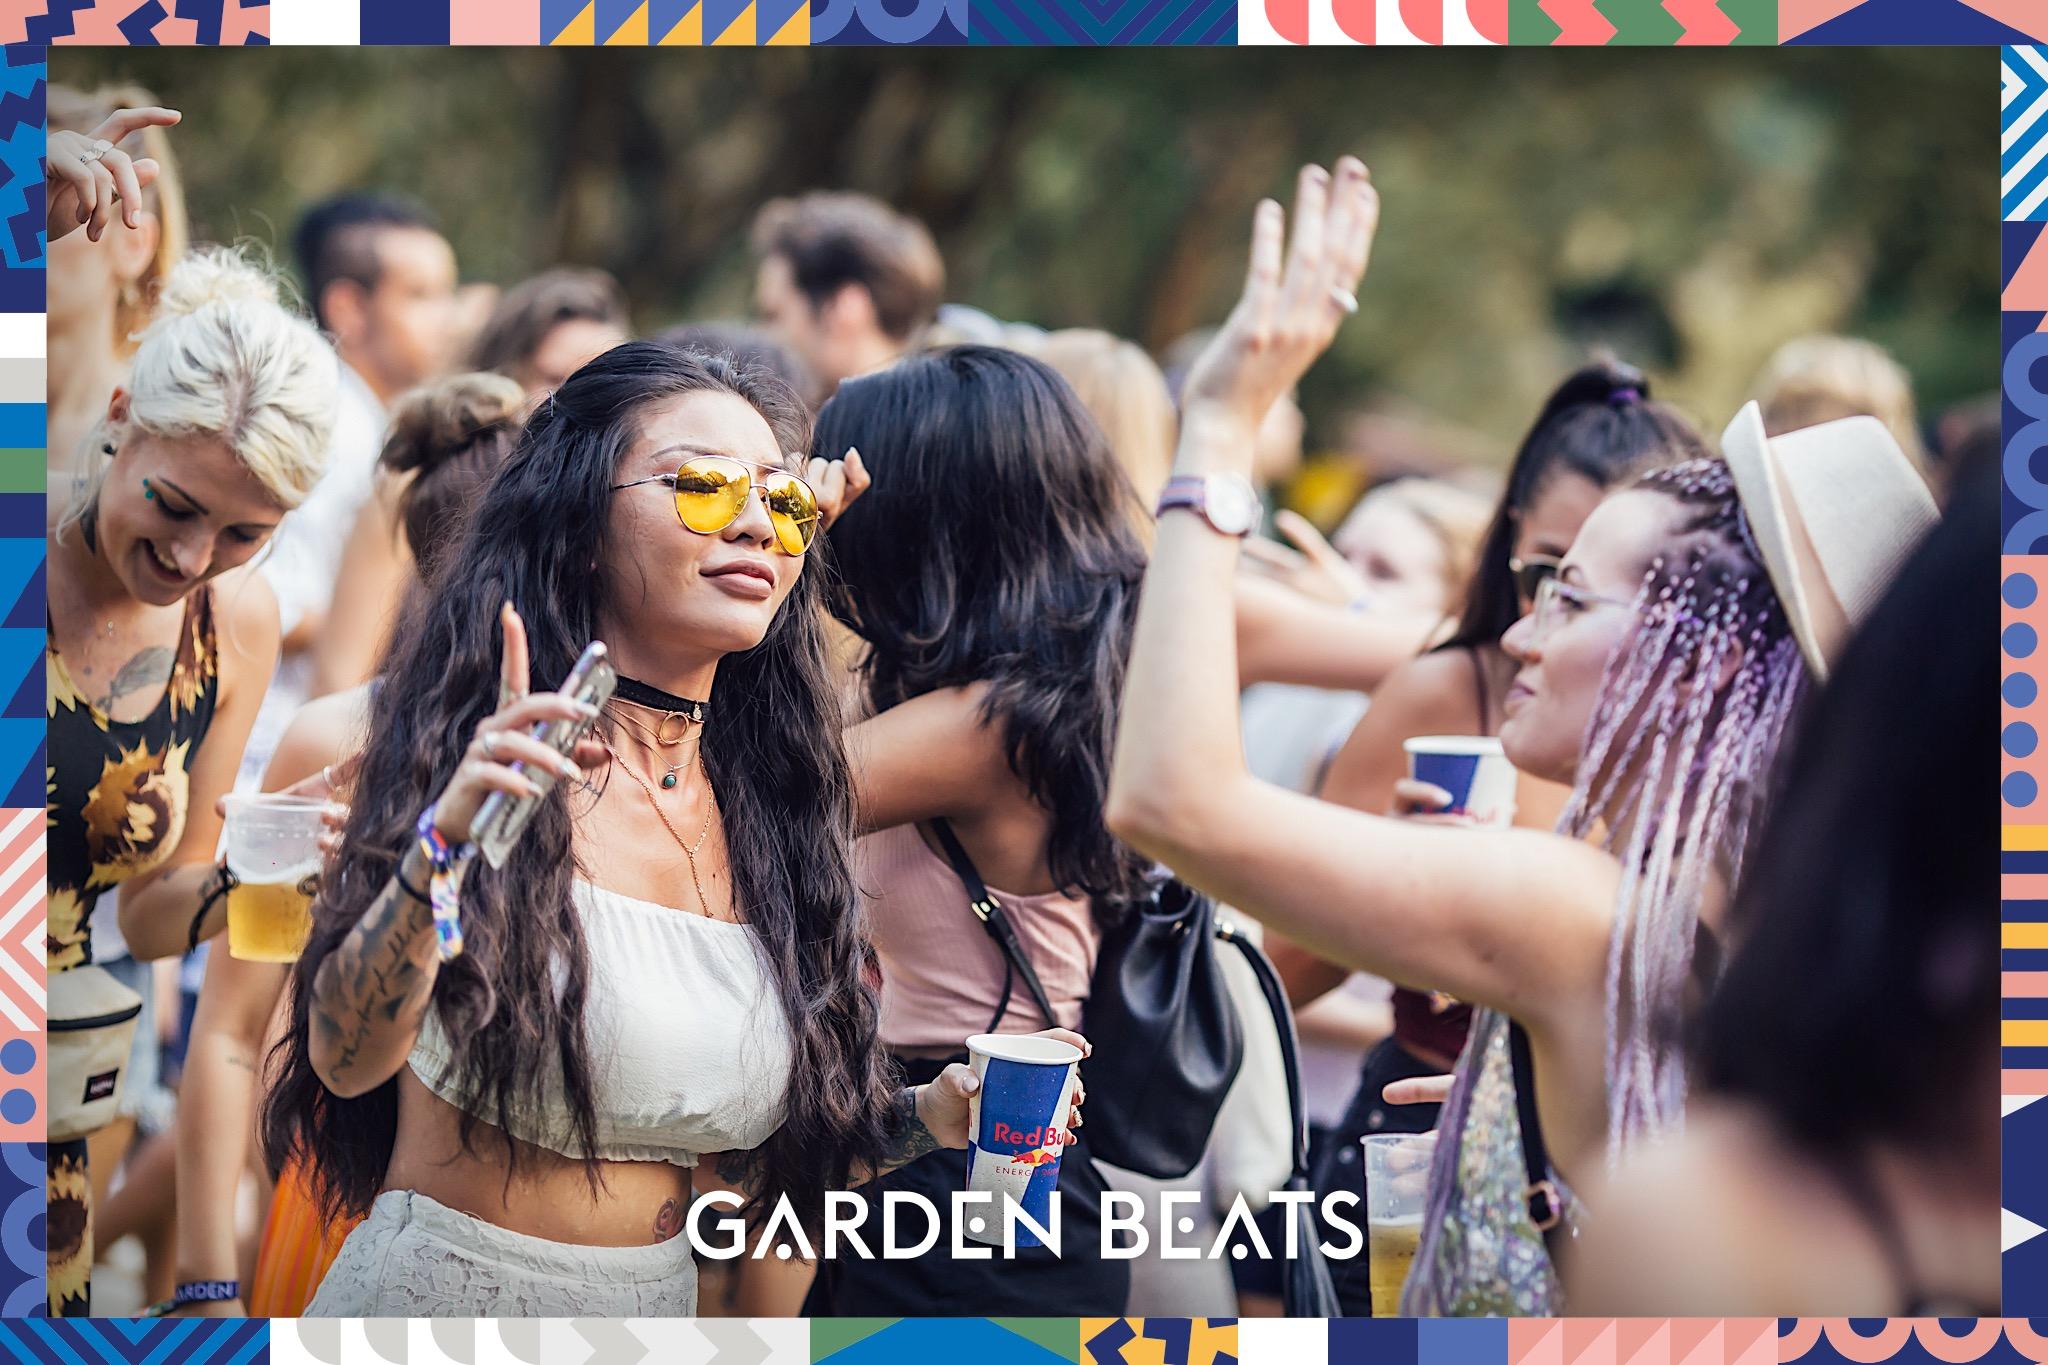 18032017_GardenBeats_Colossal592_WatermarkedGB.jpg